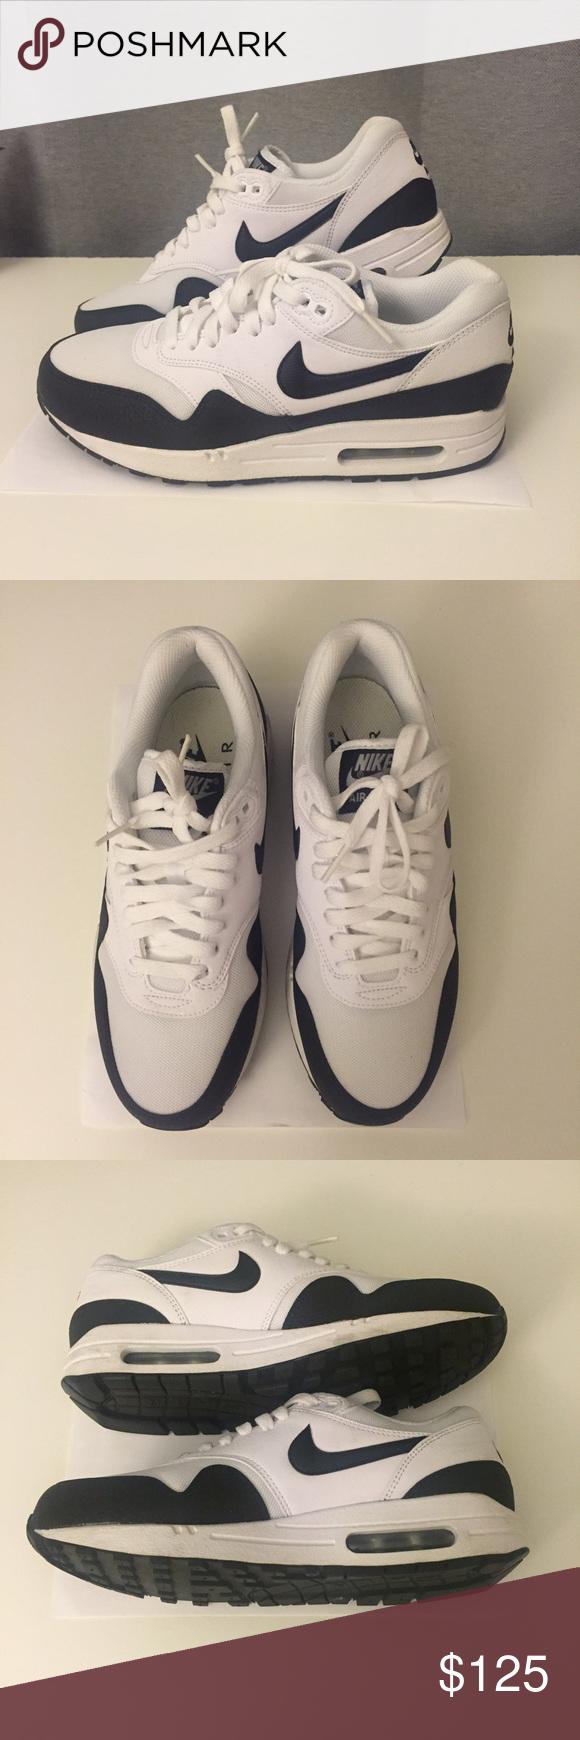 Nike Air Max Air Max Zapatillas Nike Calzado Y Zapatos Zapatillas Max e61541